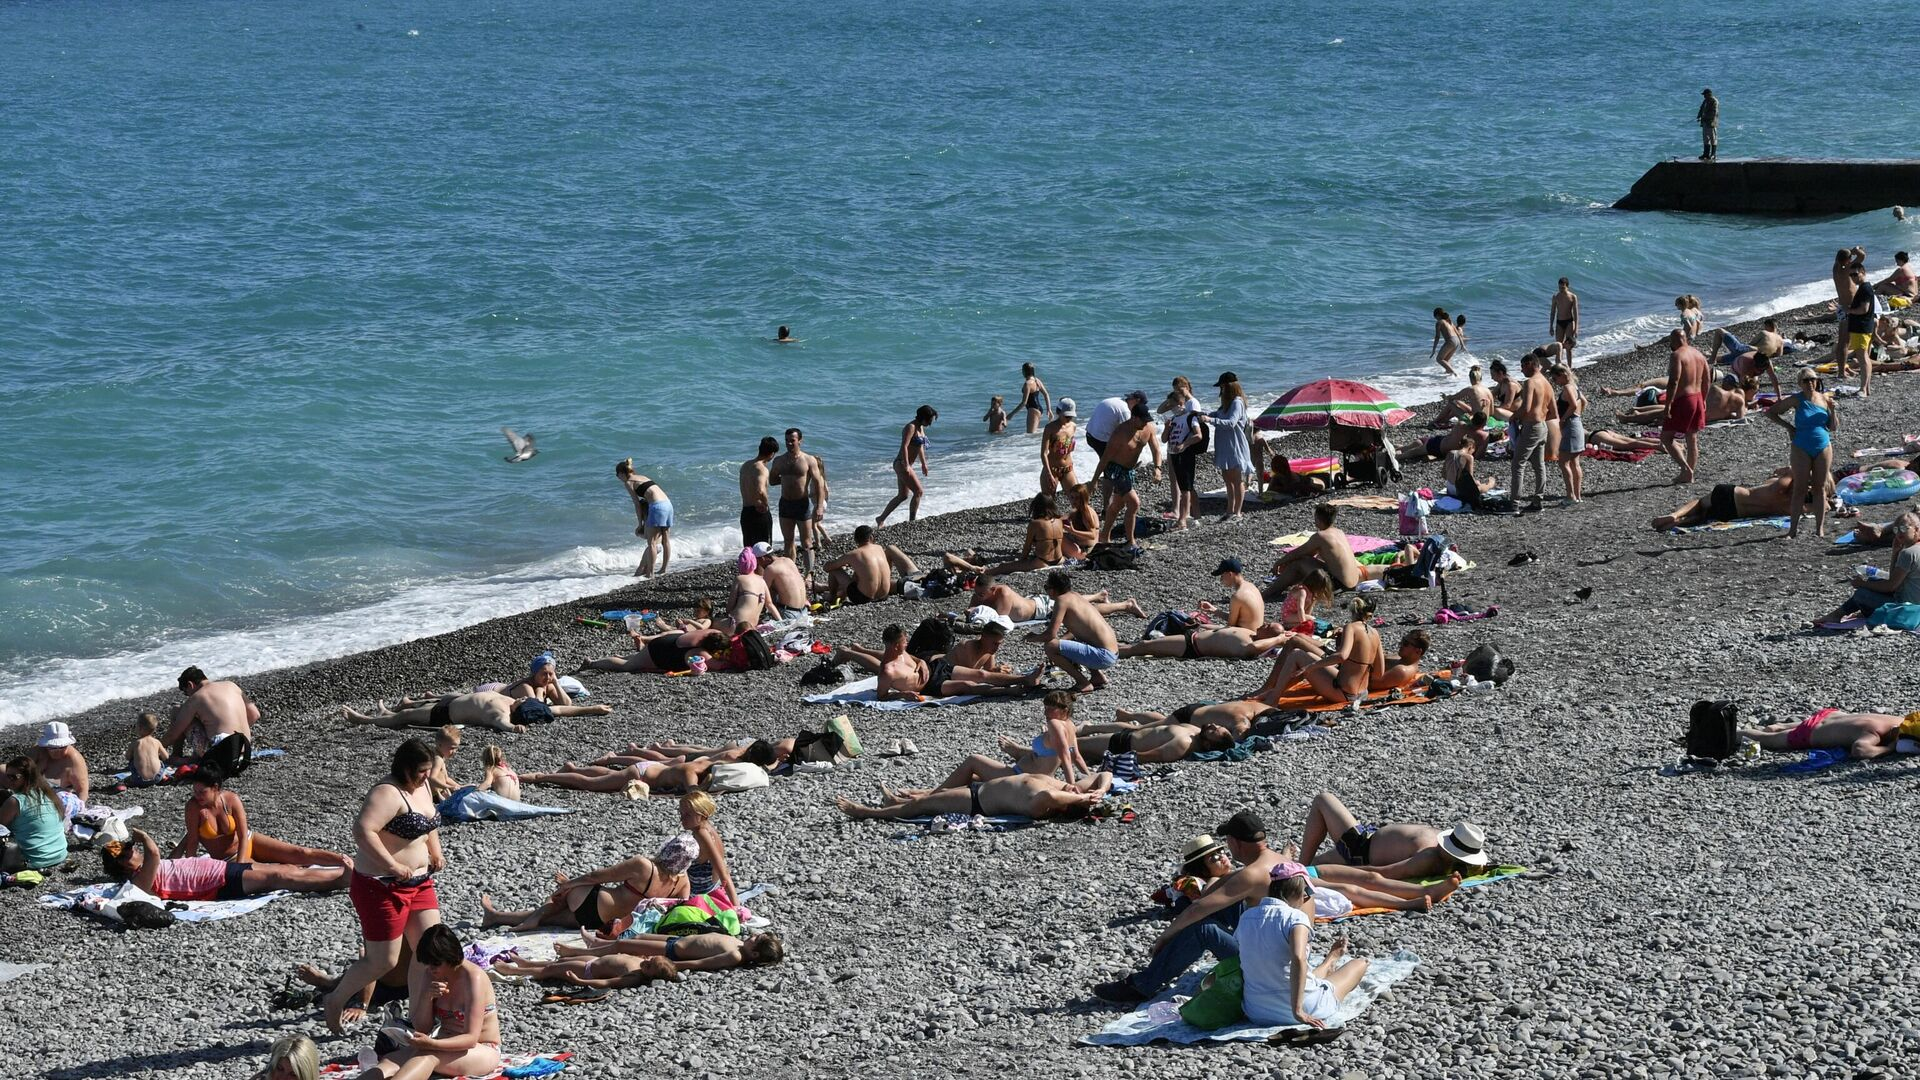 Отдыхающие на пляже в Ялте - РИА Новости, 1920, 06.07.2021